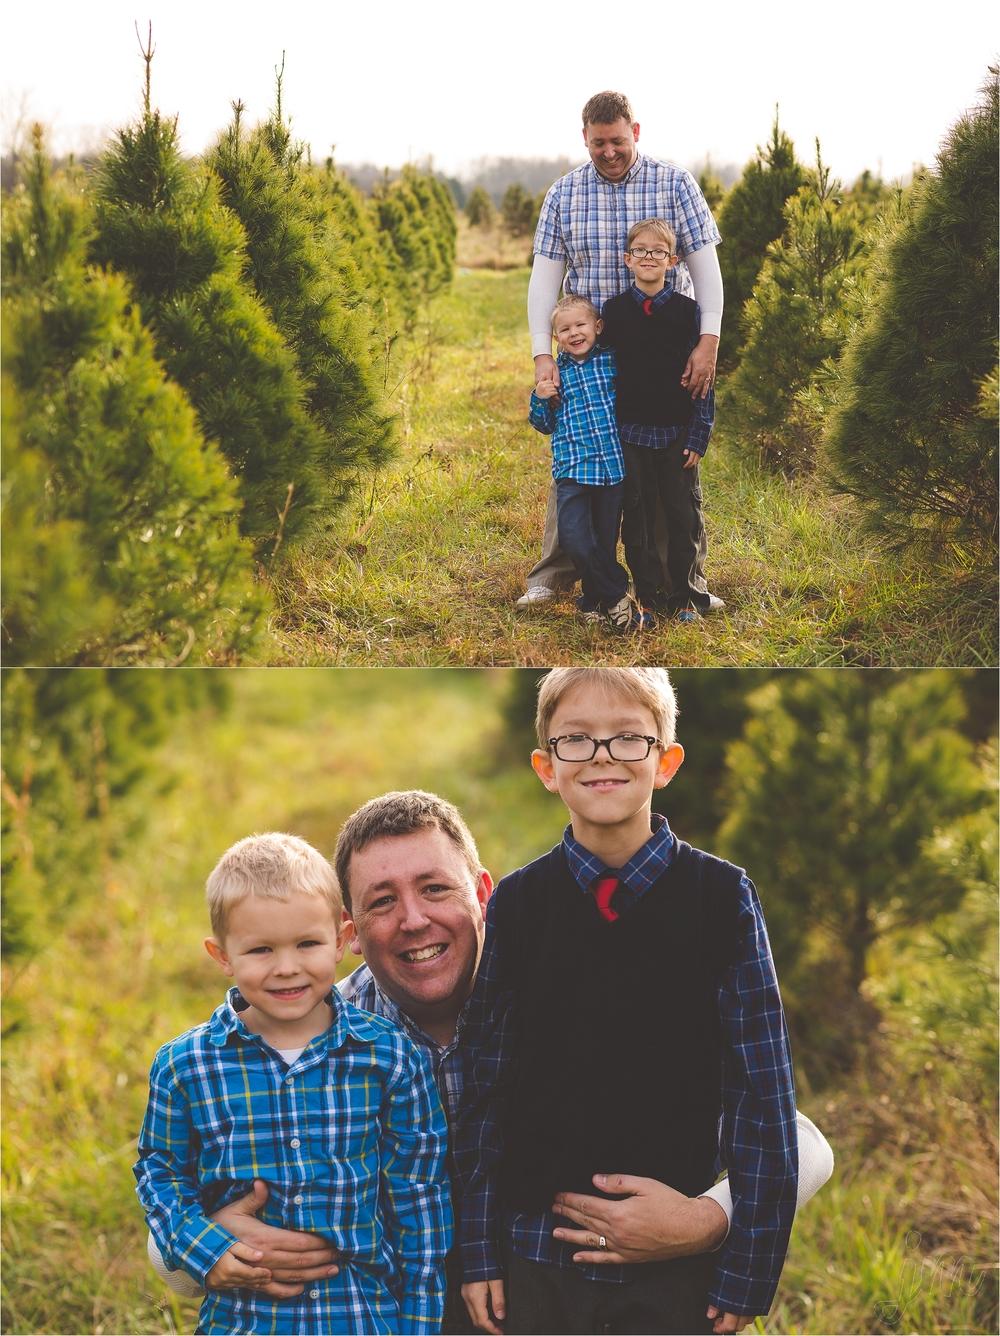 christmas-tree-farm-session-pnw-jannicka-mayte_0052.jpg